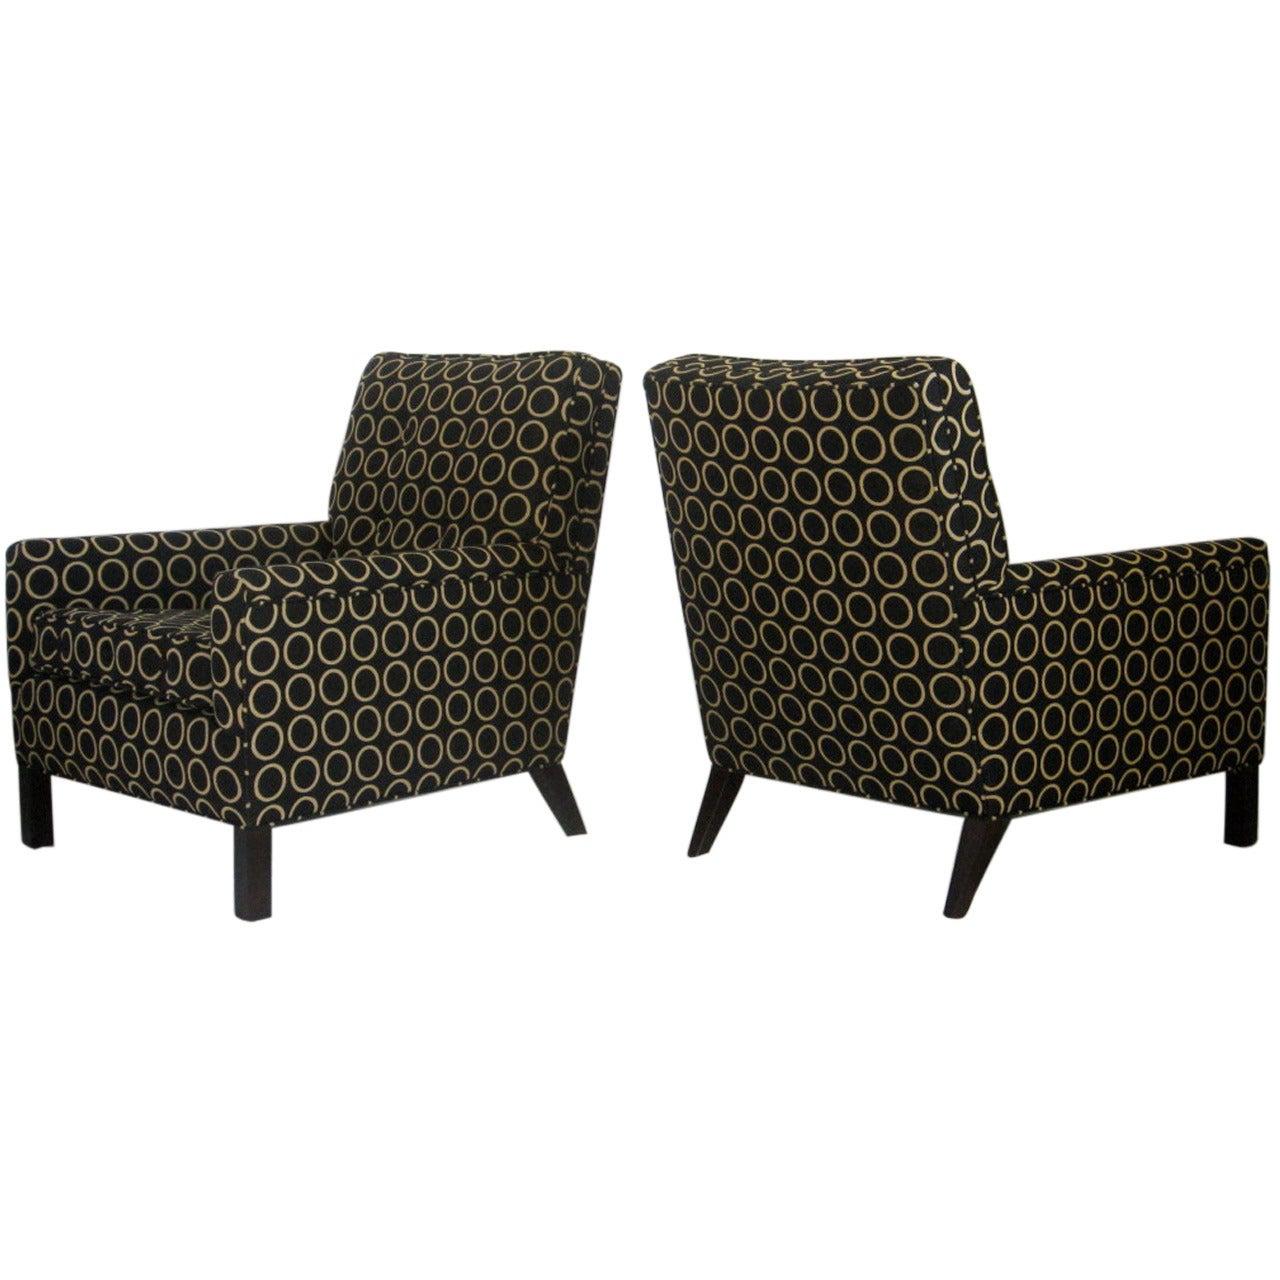 T.H. Robsjohn-Gibbings, 1954 for Widdicomb lounge chairs